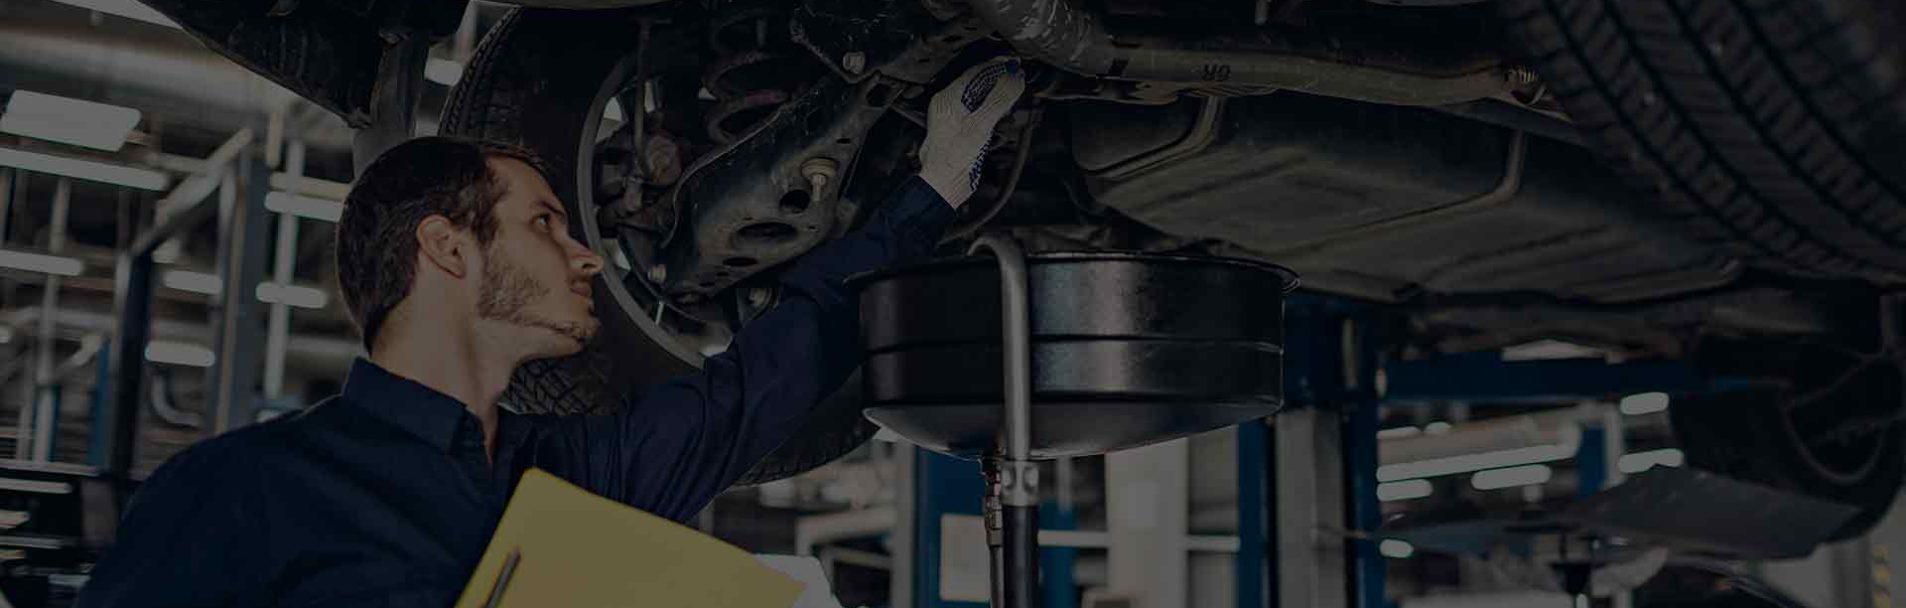 car-service-banner-image3